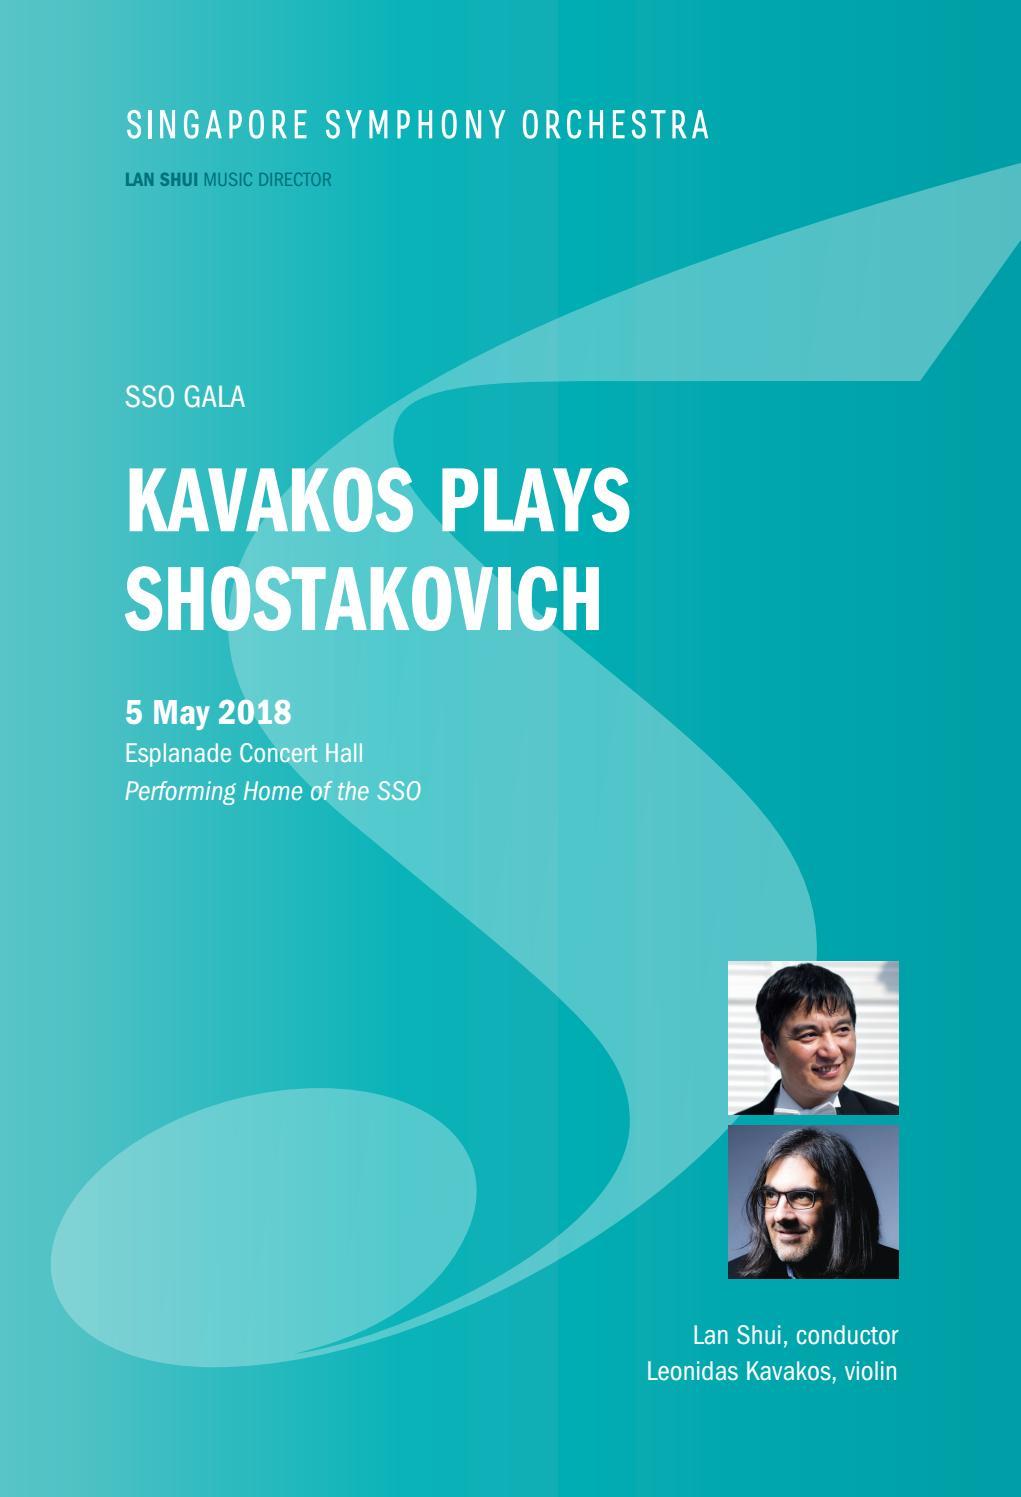 SSO Gala • Kavakos Plays Shostakovich by Singapore Symphony - issuu